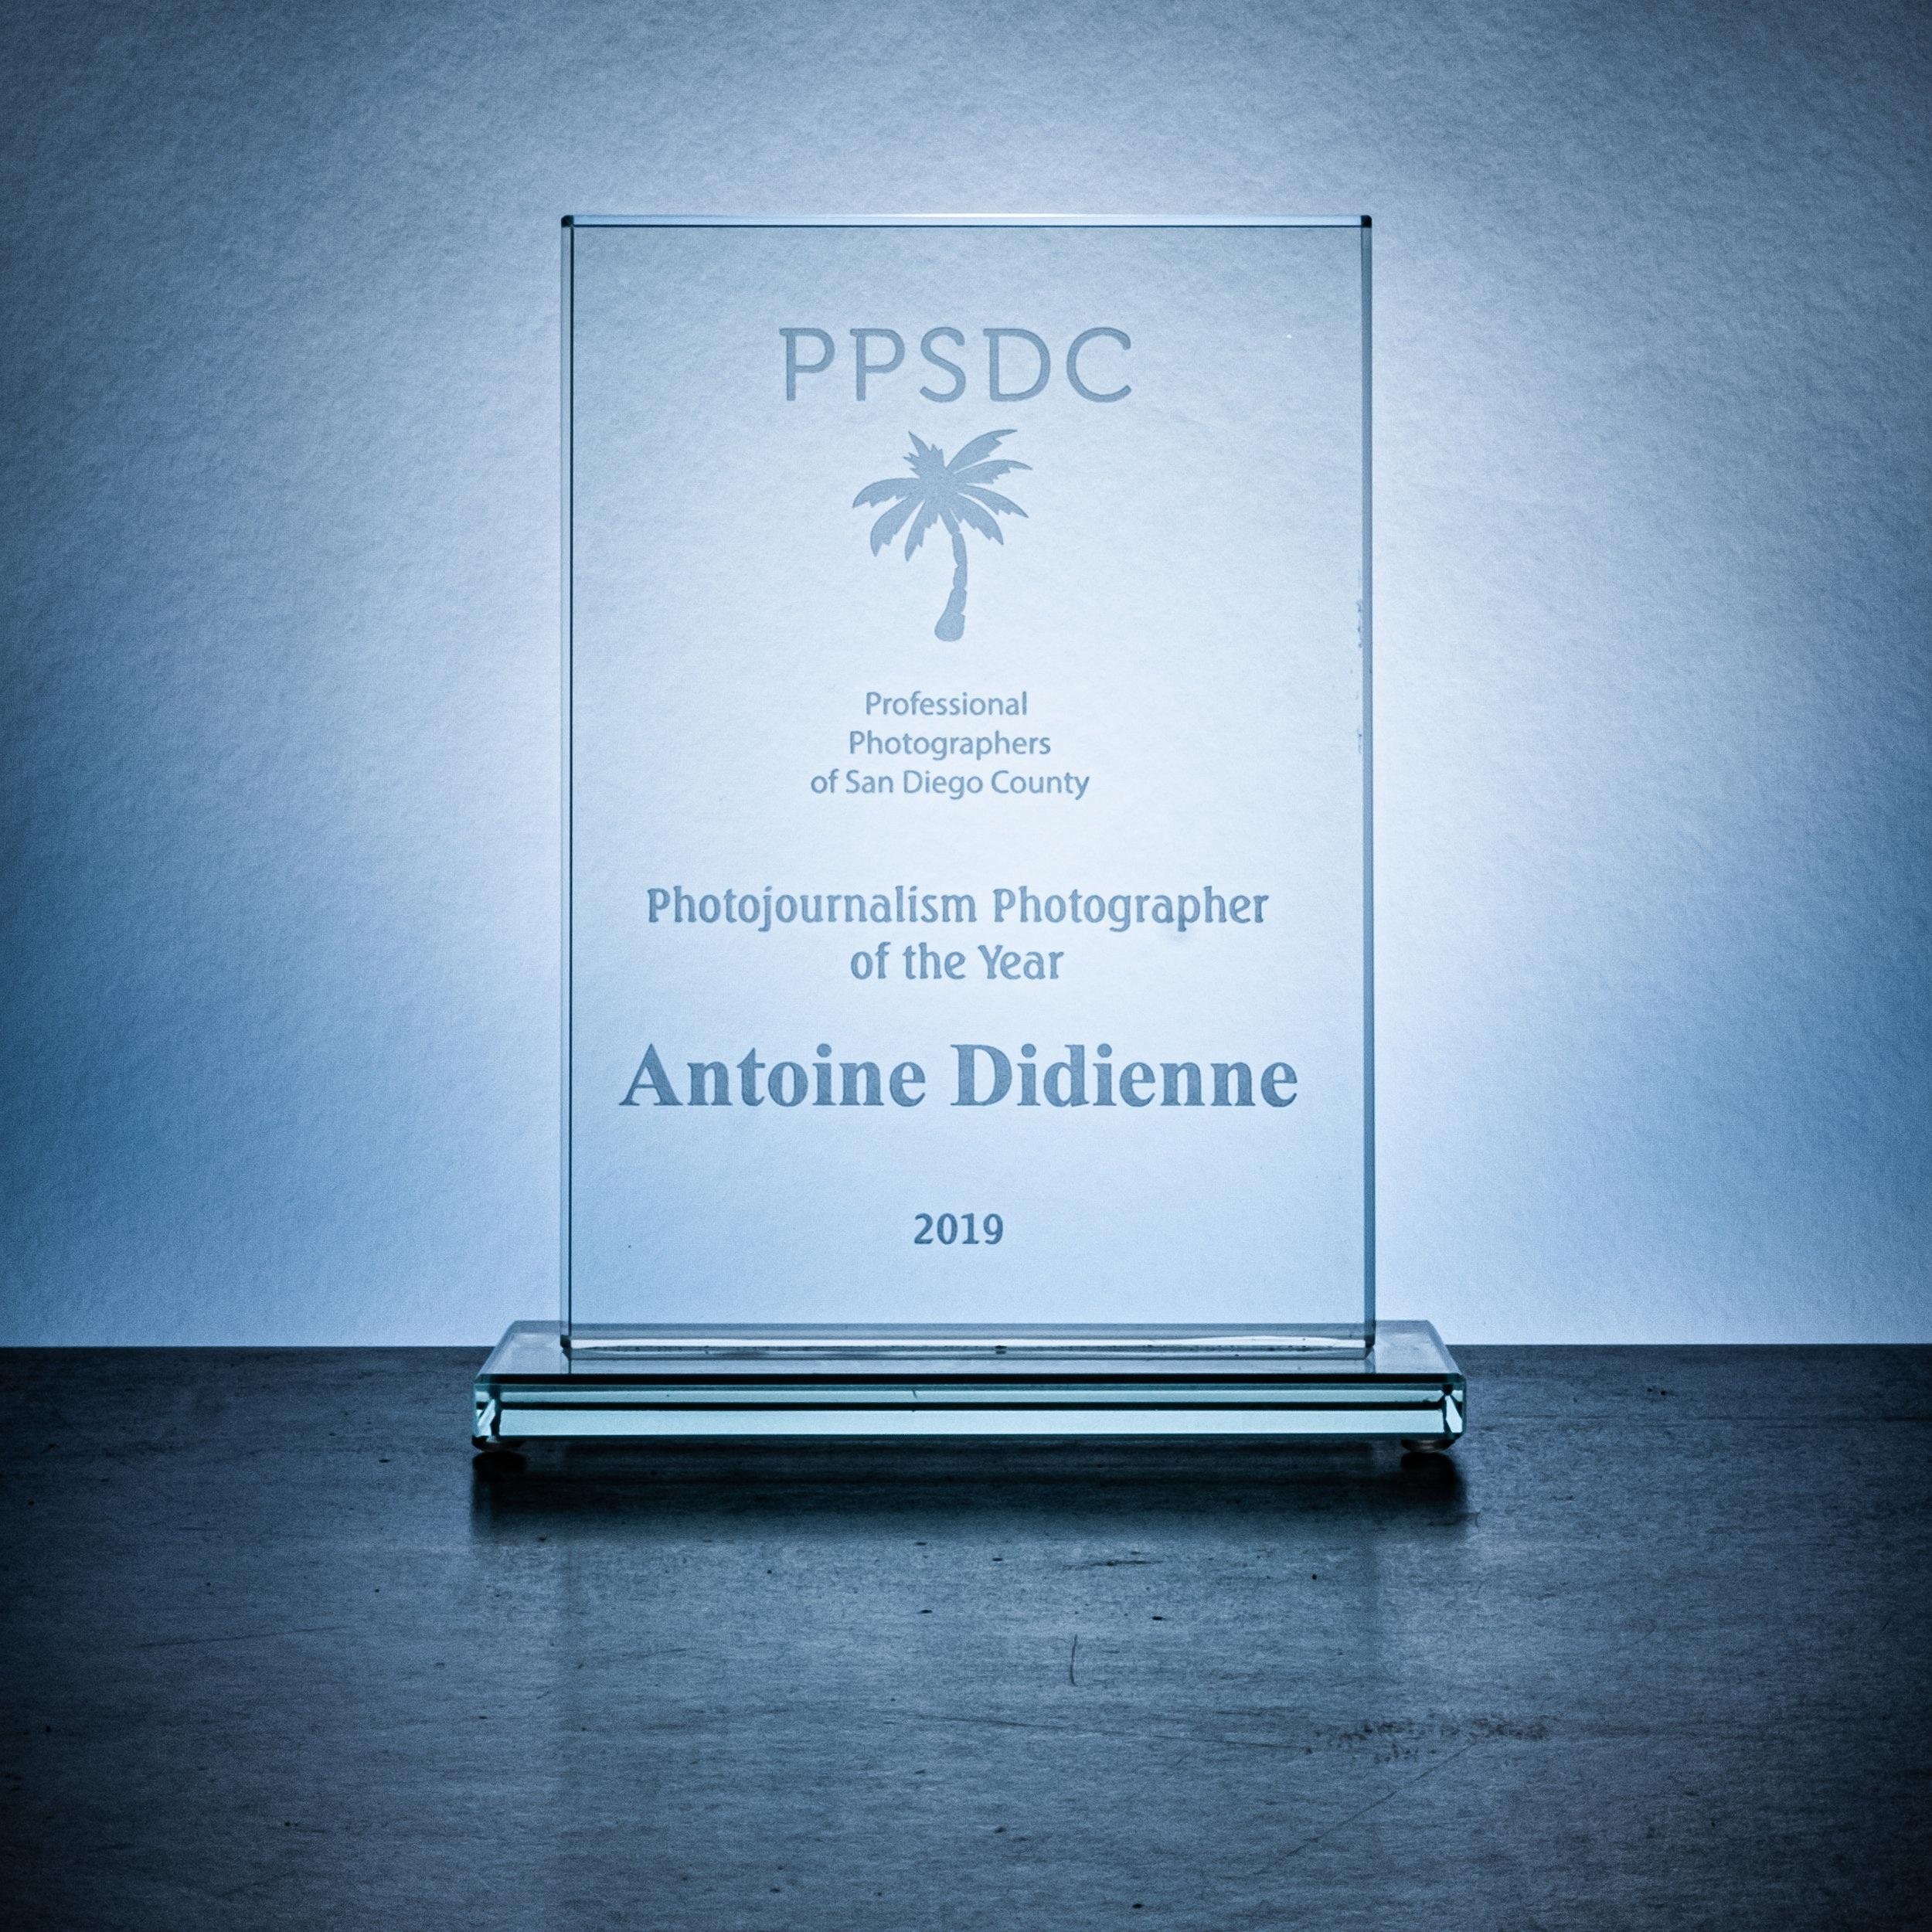 PPSDC Award